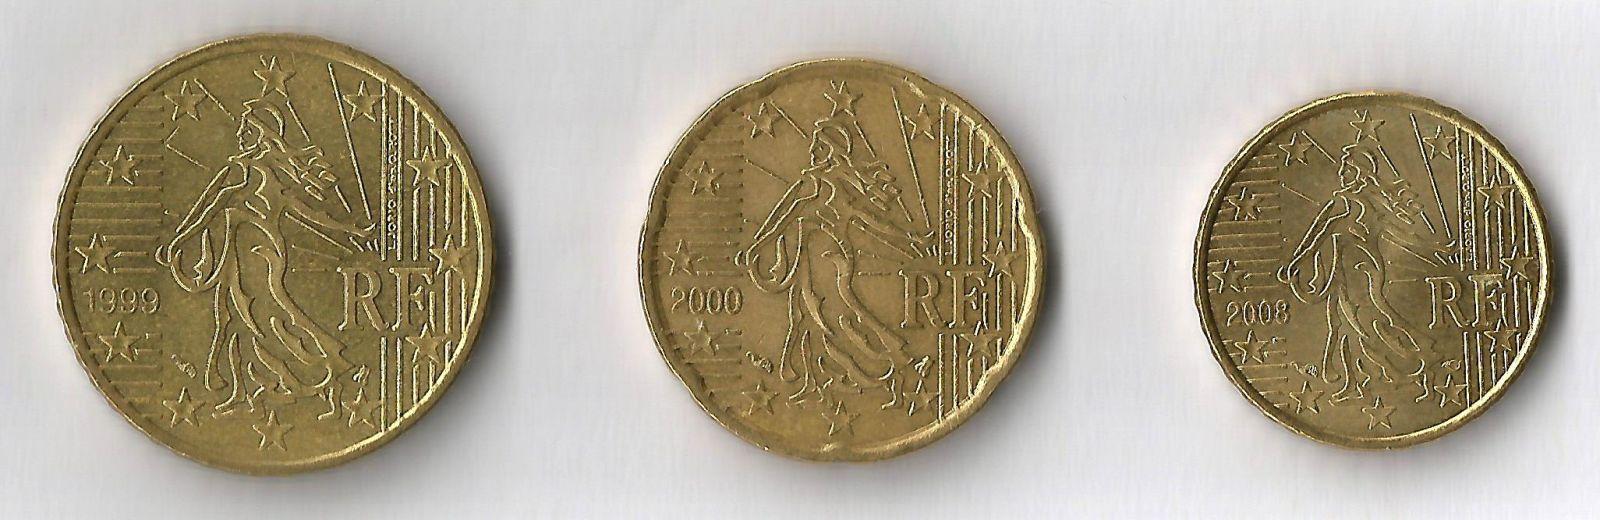 francia 50,20,10 cent